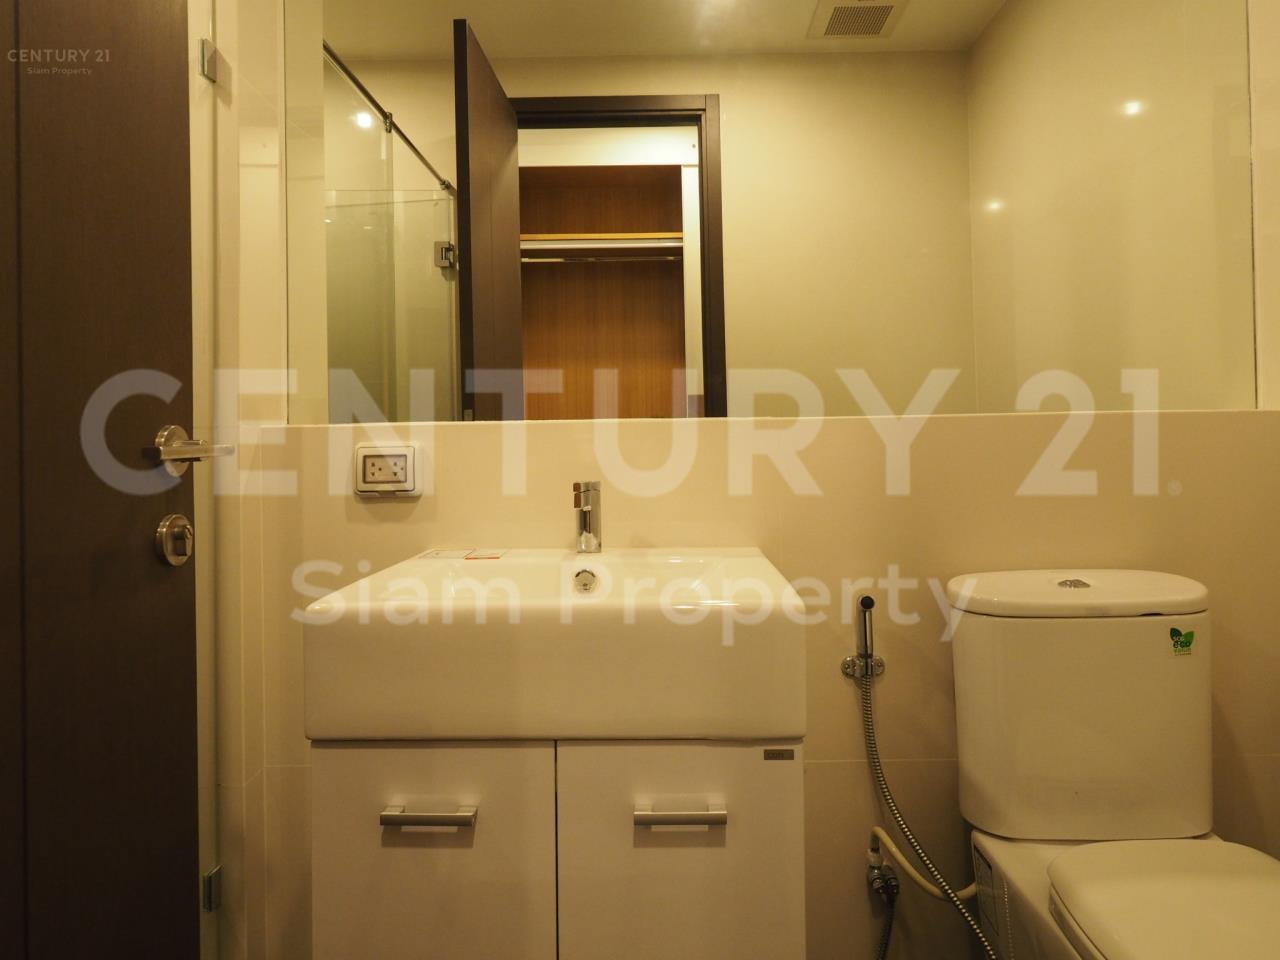 Century21 Siam Property Agency's Rhythm Sathorn - Narathiwas 17